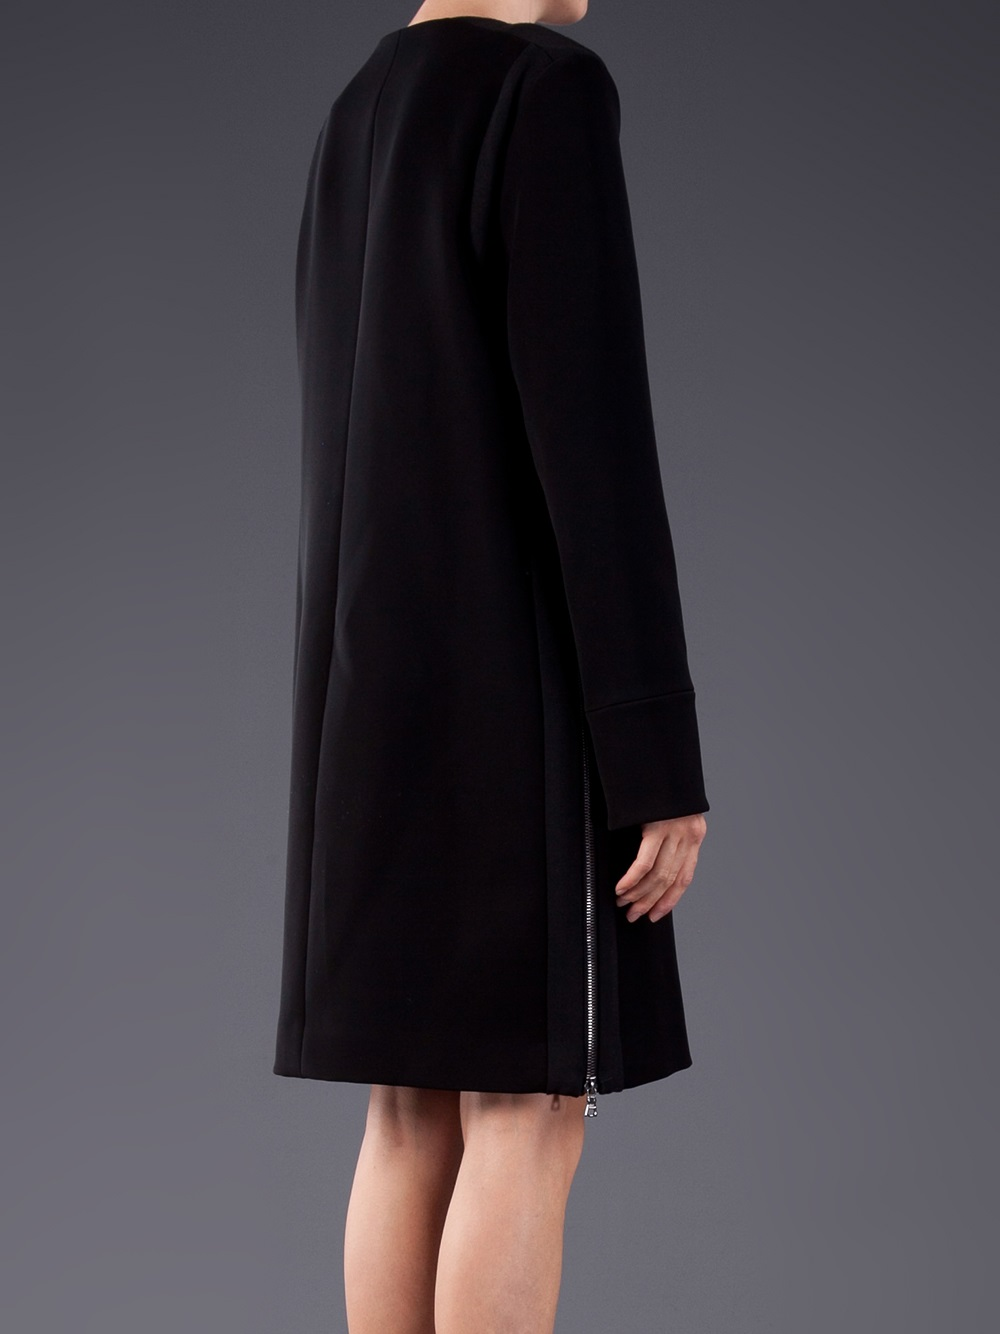 j brand florence coat - photo#29